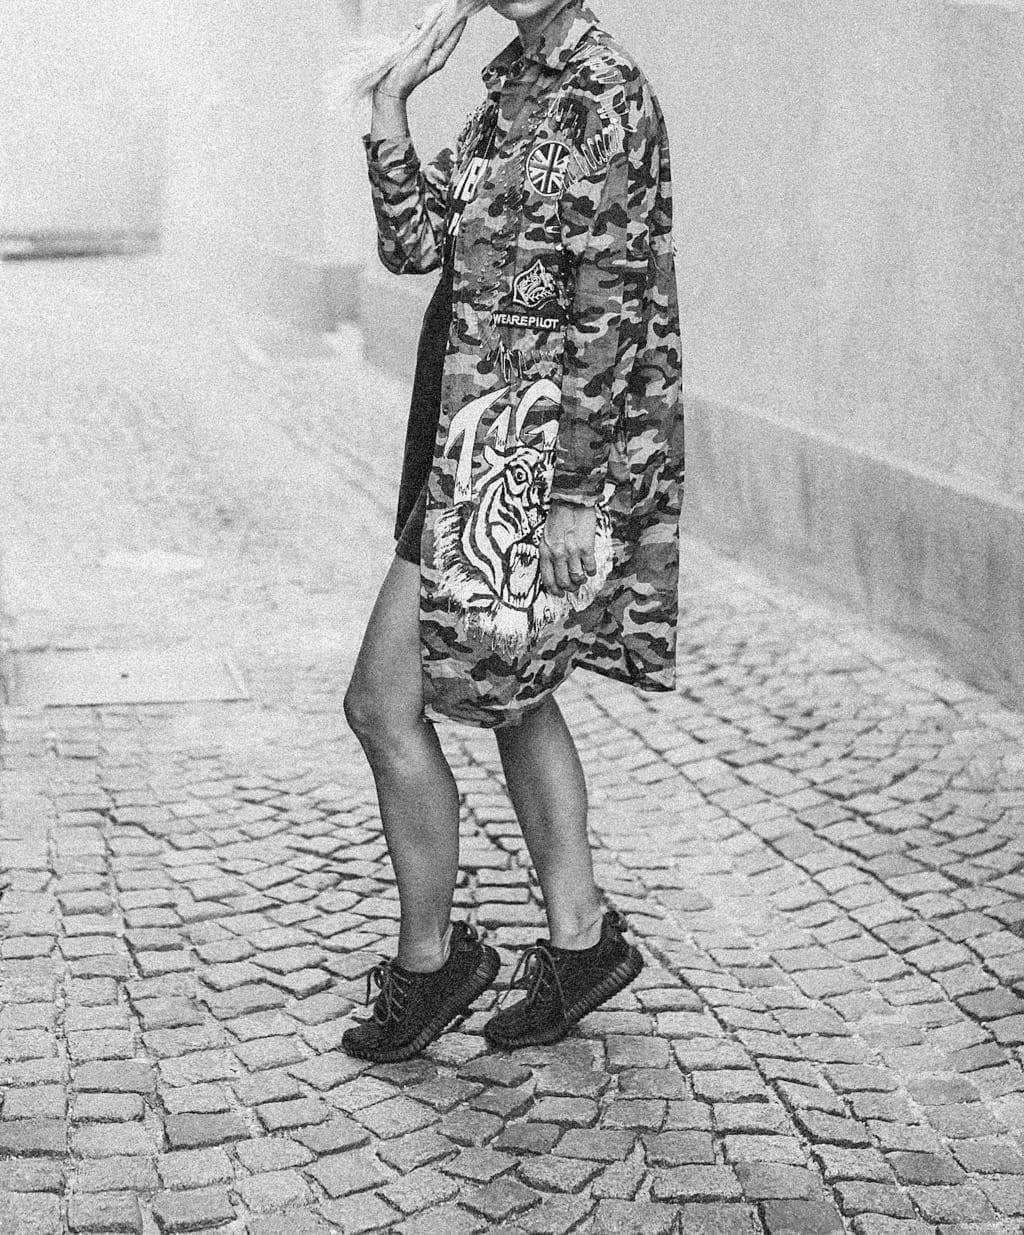 CK-1606_salzburg-fashion-street-style-look-magazine-karin-kaswurm-electric-love-2016-festival-camouflage-military-jacket-8952